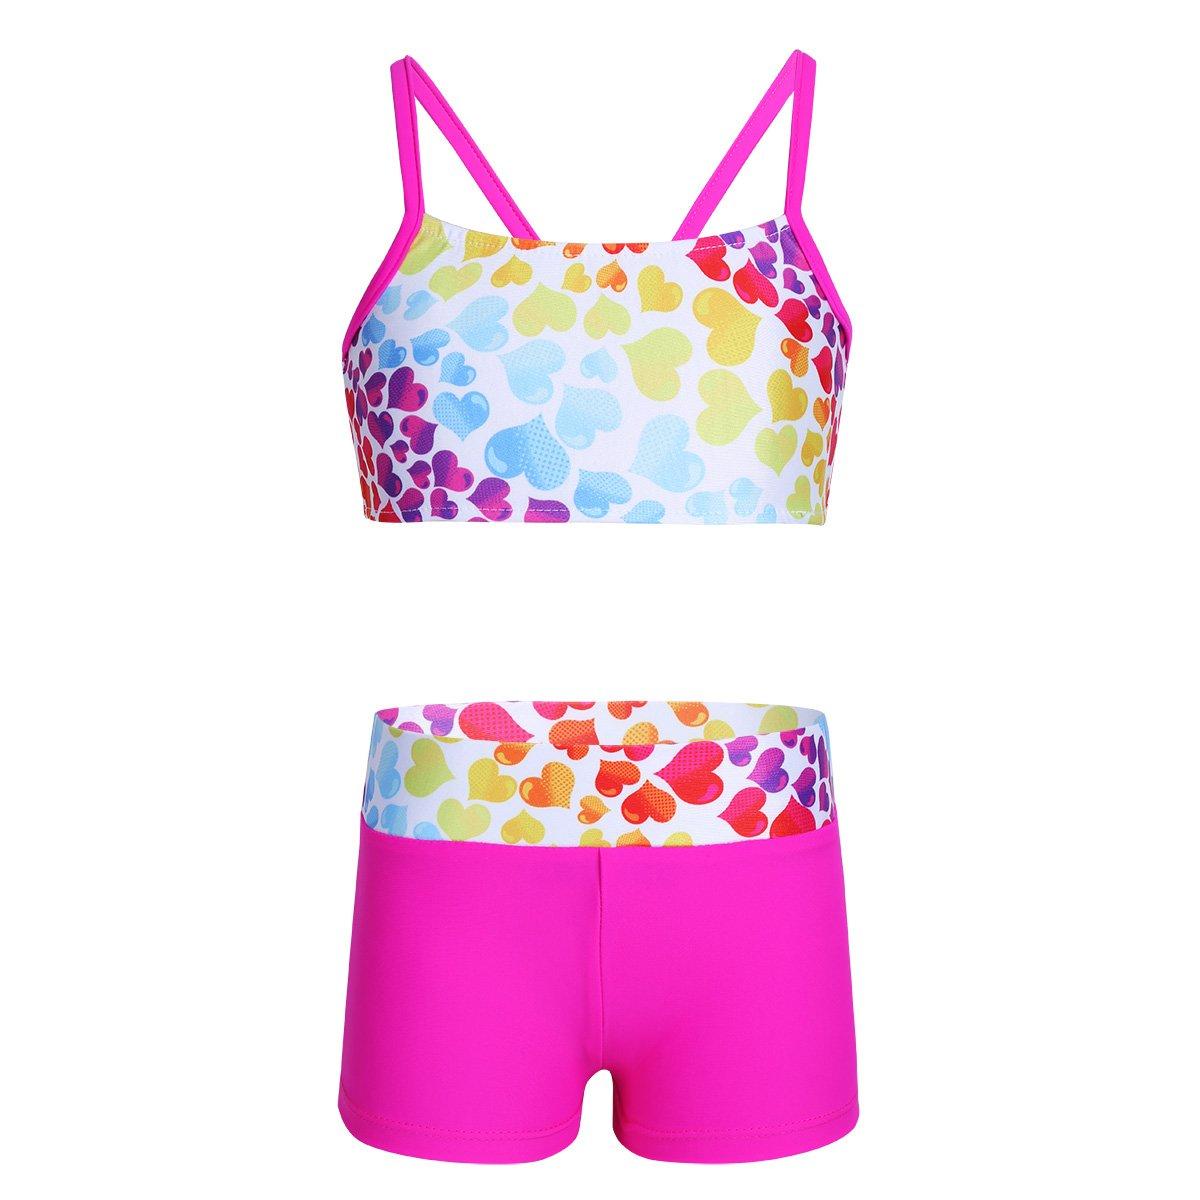 MSemis Girls 2 Piece Bikini Set Tankini Ballet Gymnastics Dance Outfits Crop Tops with Booty Short Dancewear